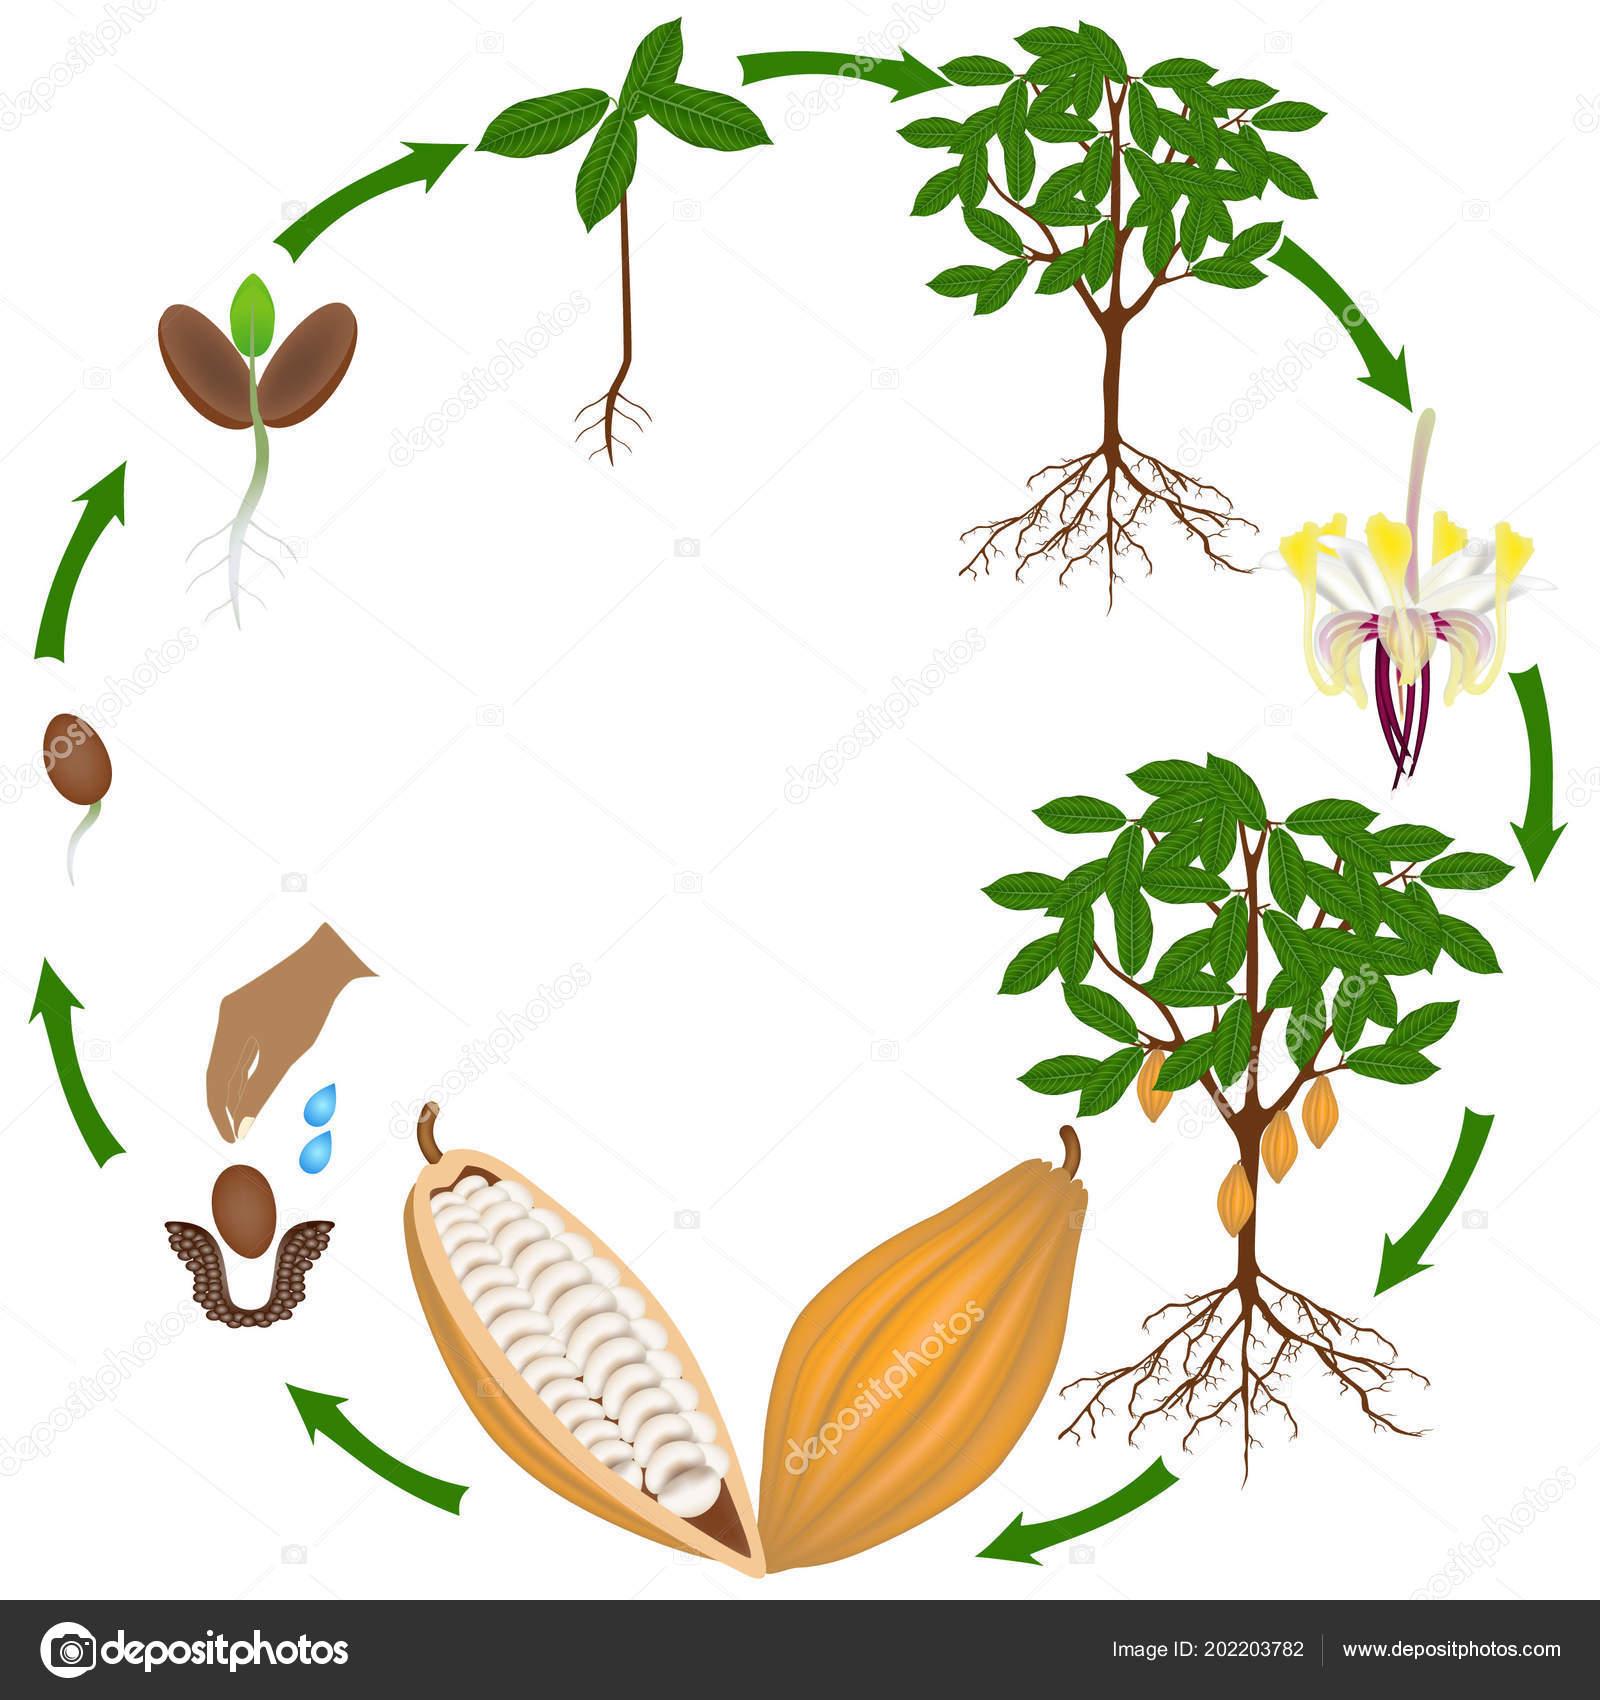 Background Tree White Life Cycle Cocoa Tree White Background Stock Vector C Zaqzaq81 202203782